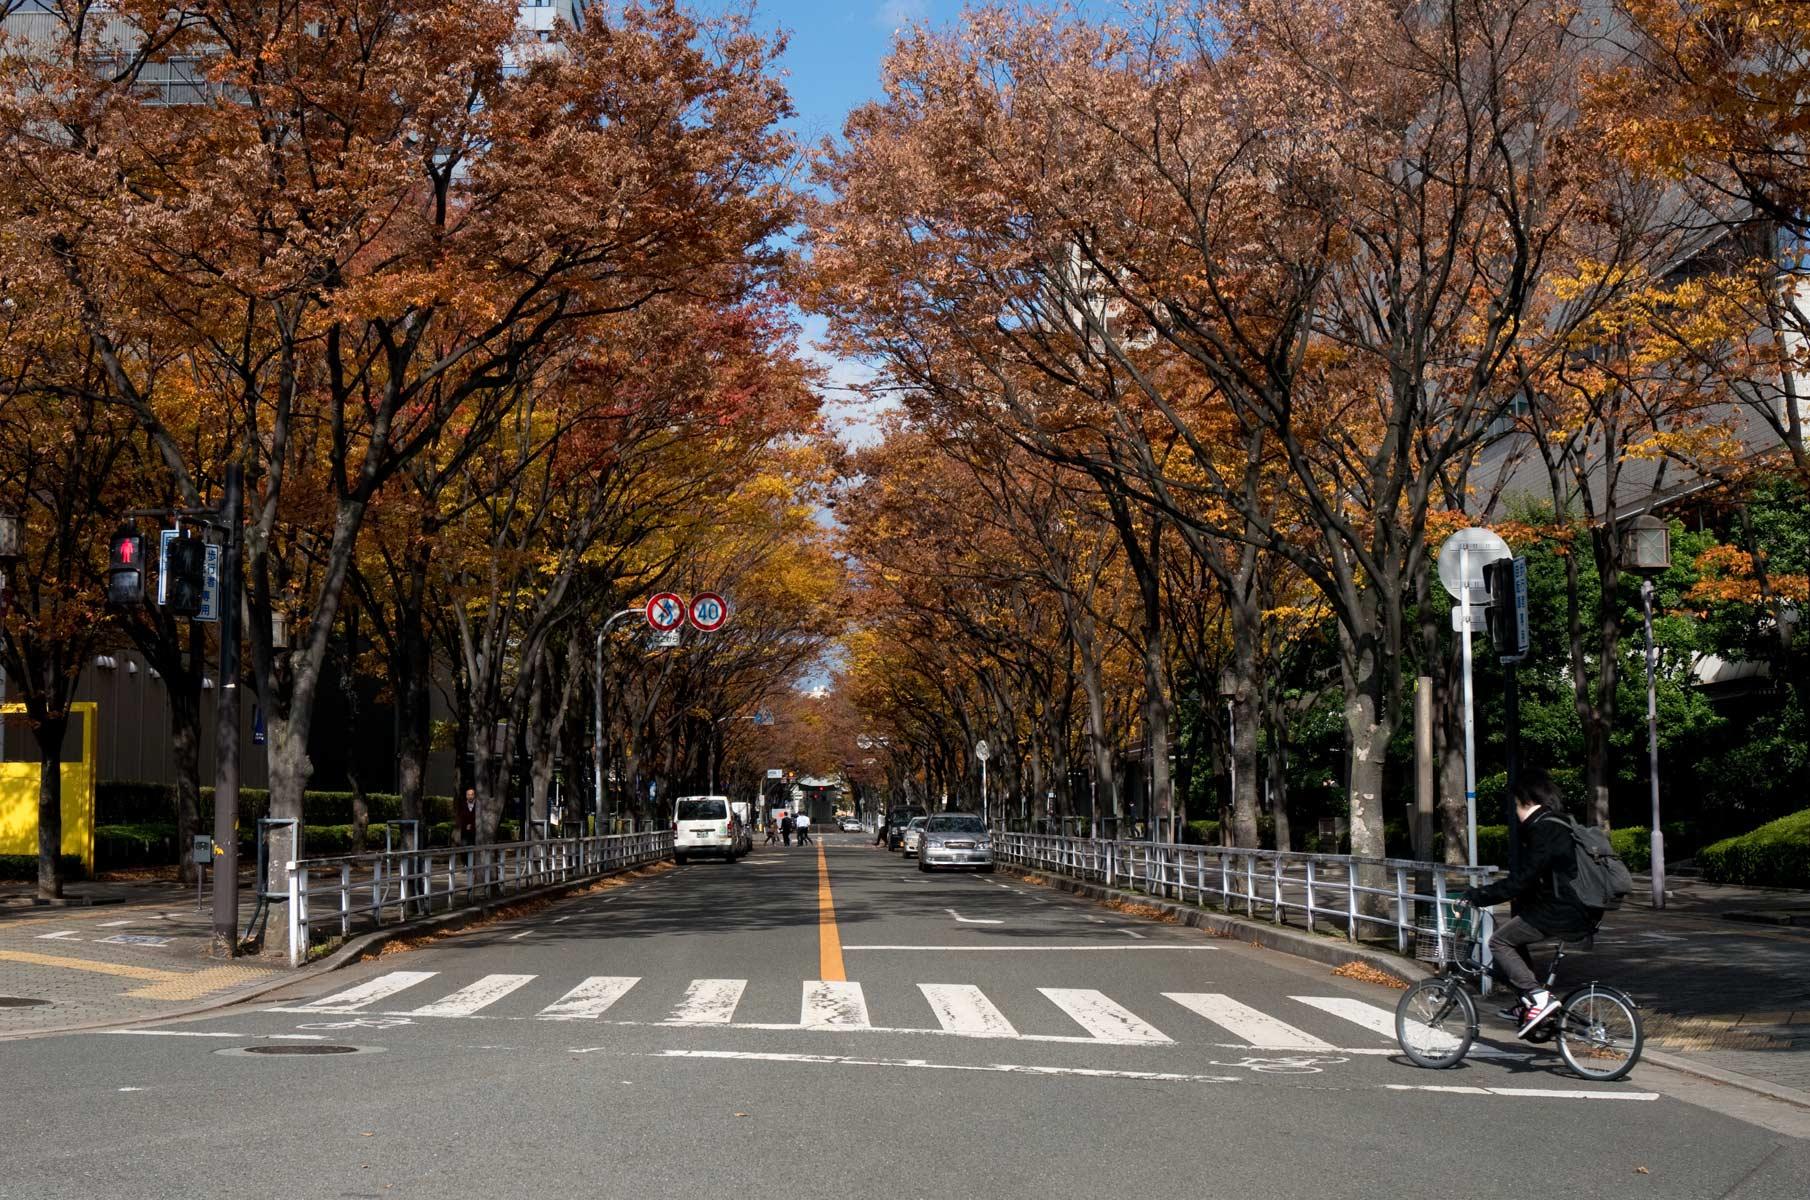 Straße im Herbst in Osaka, Japan